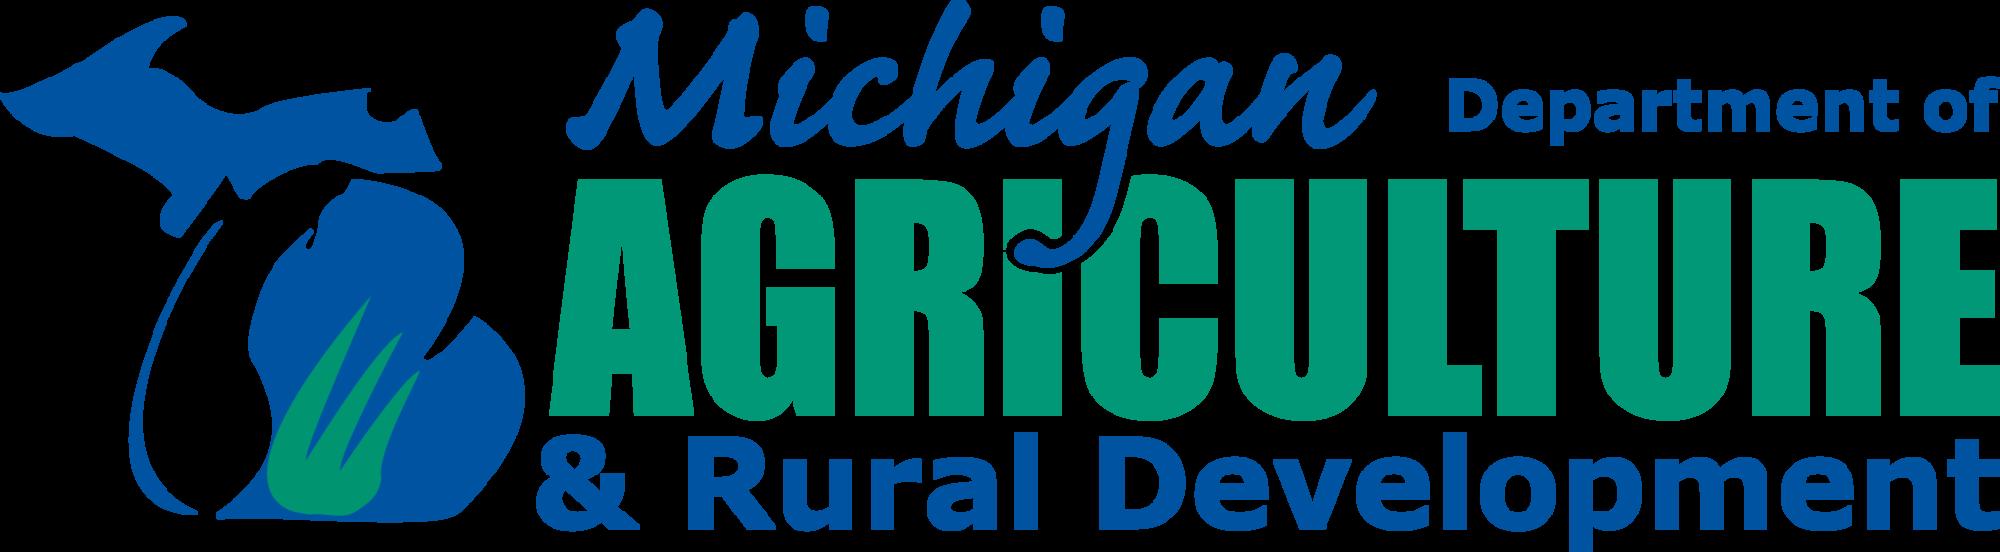 Gd-Vendor-logo-Michigan-Department-of-Agriculture